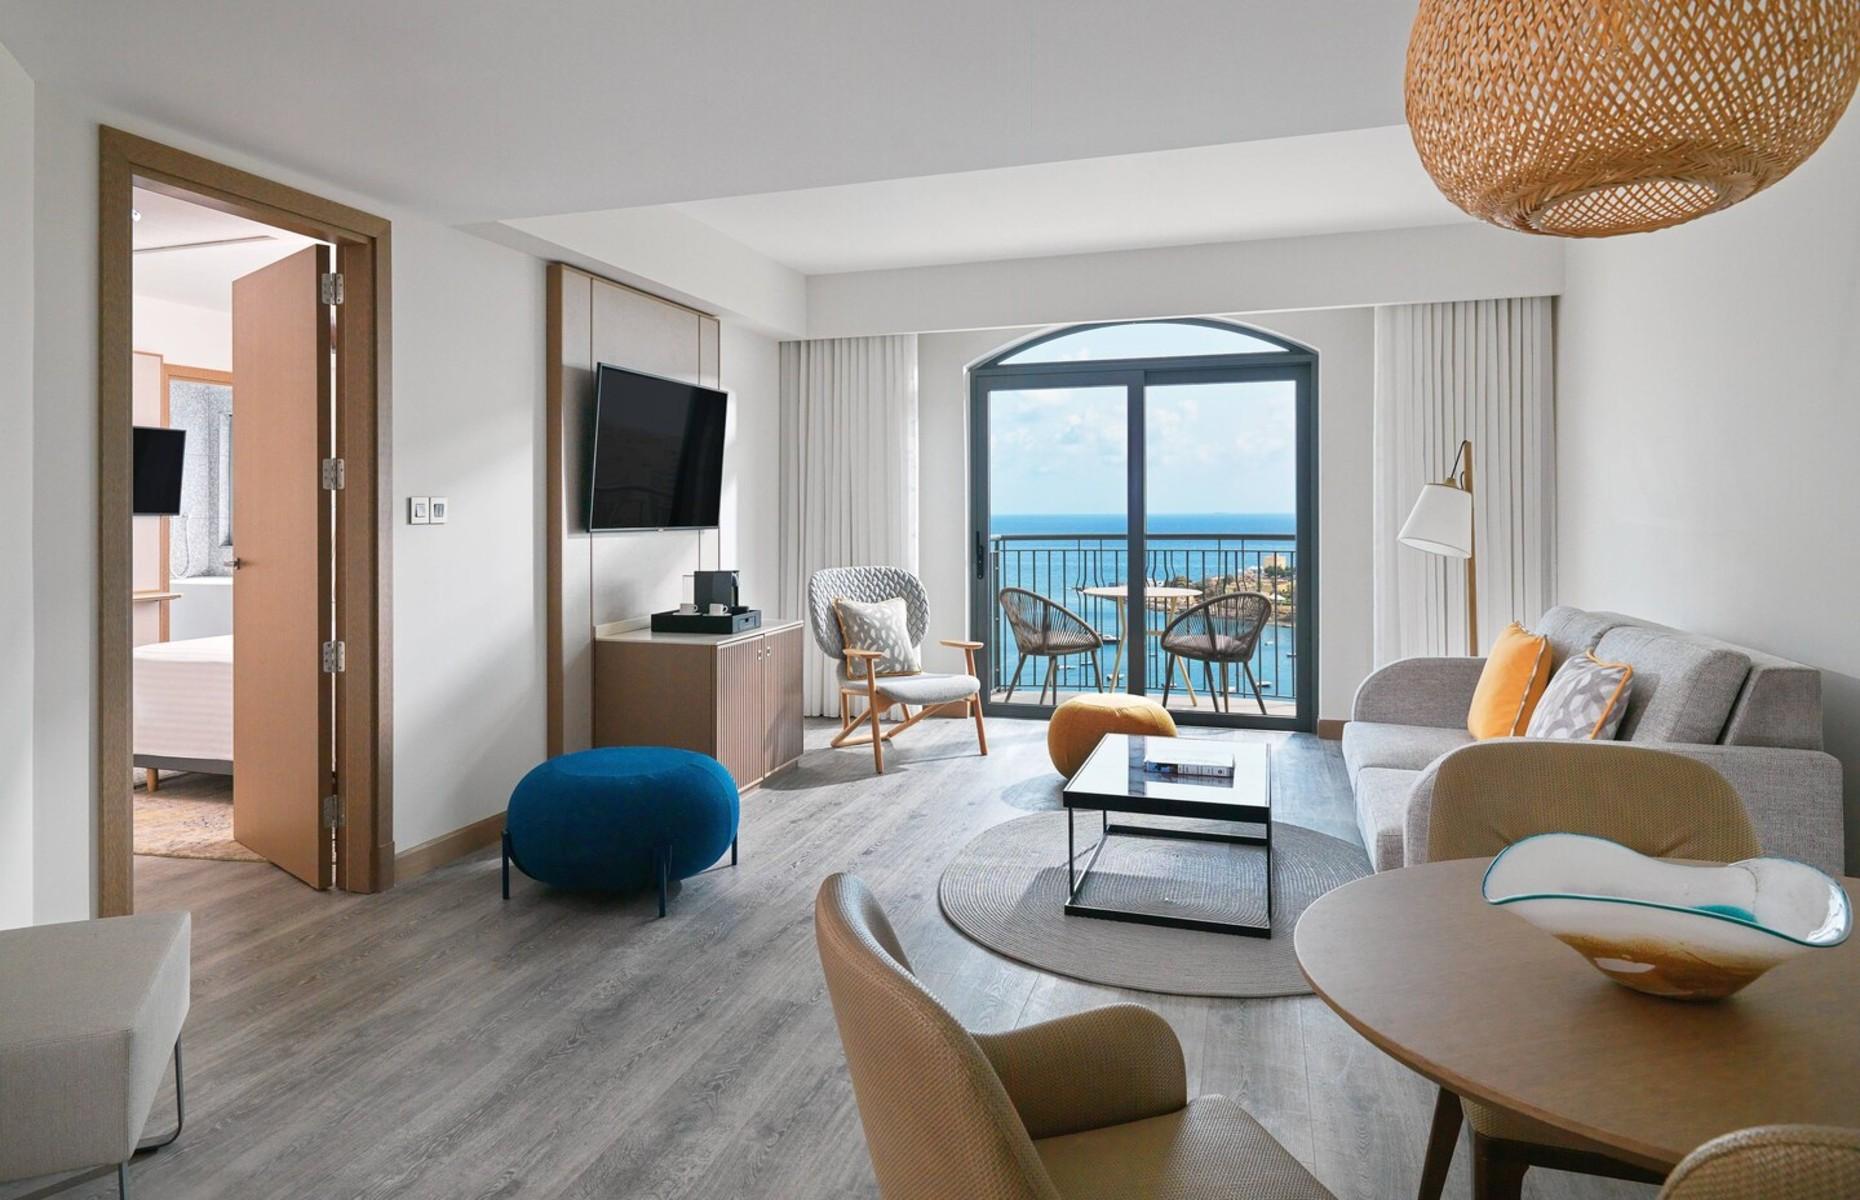 Marriott Malta bedroom (Image: Marriott.com)